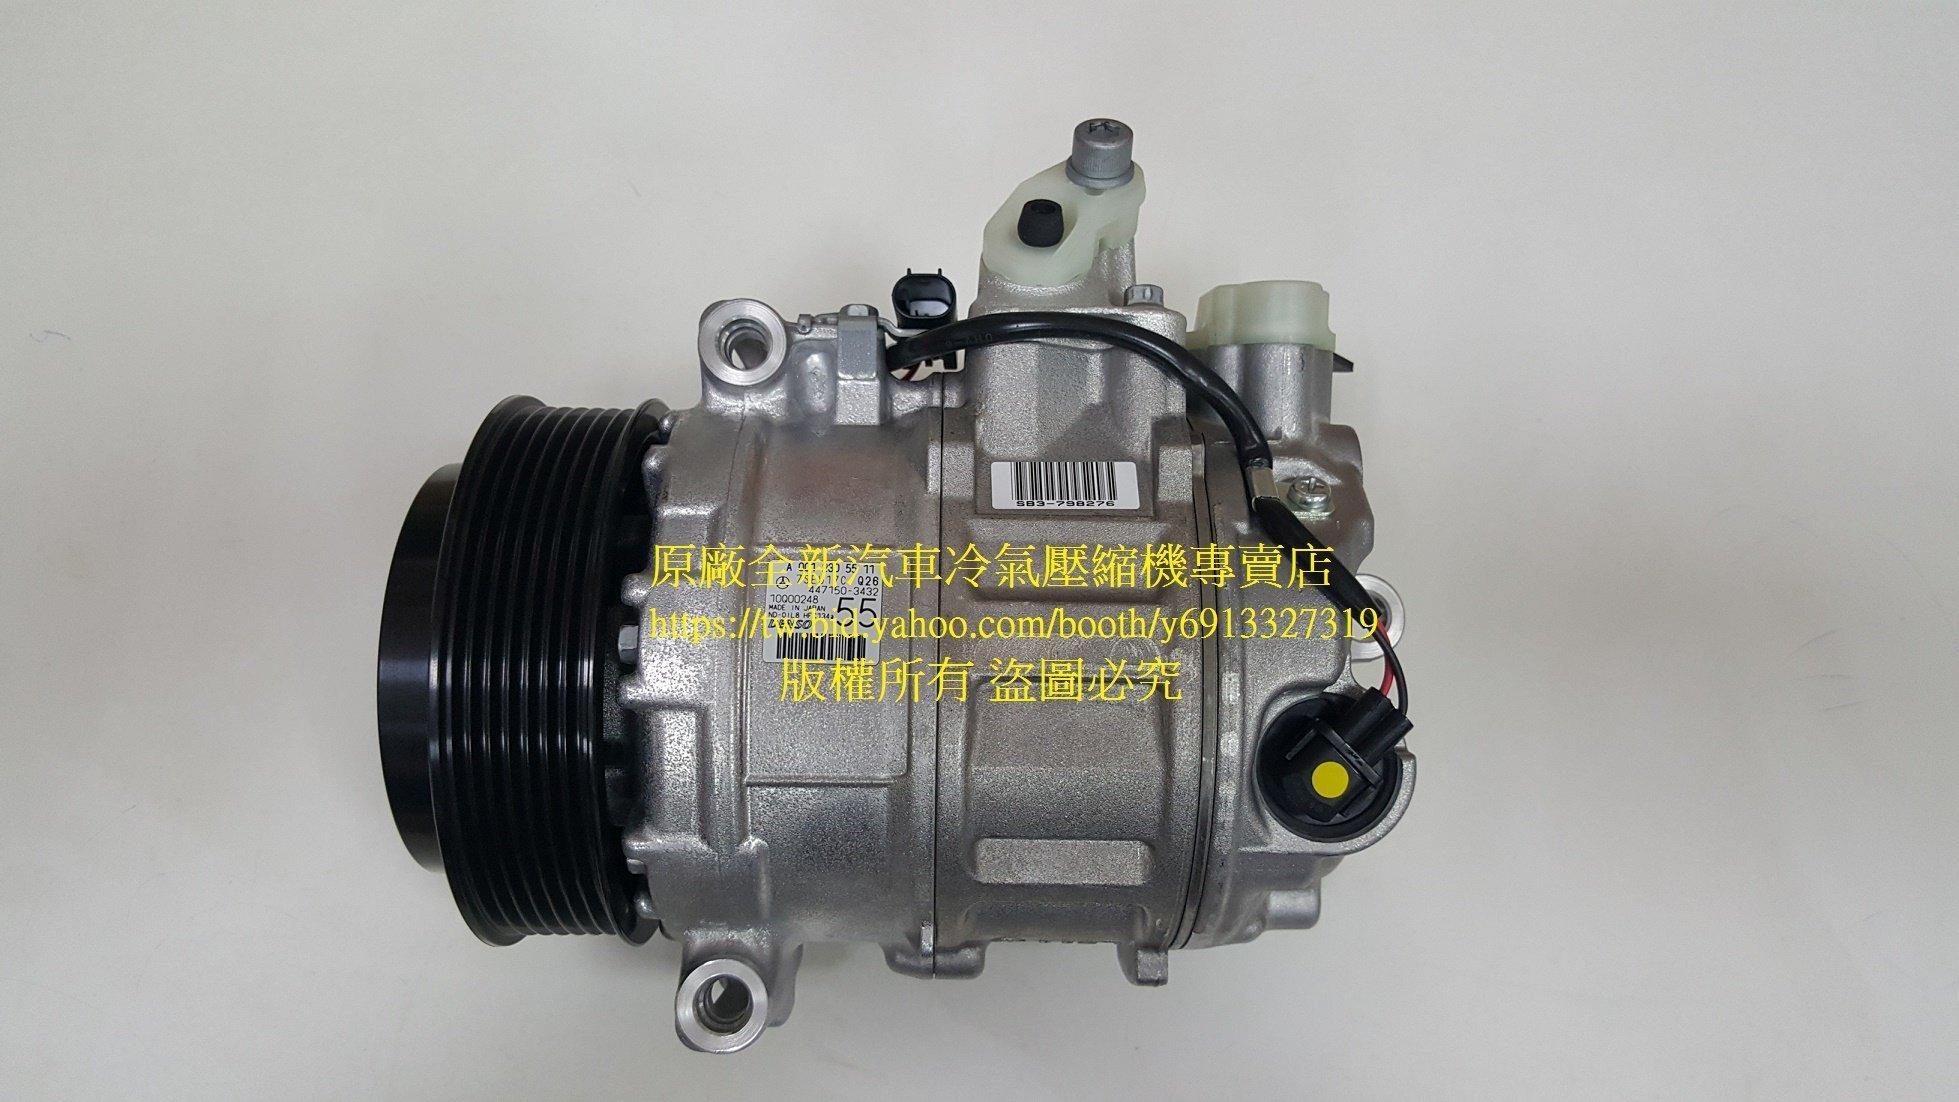 M.BENZ 賓士W211 E200 W203 C180 C200 W220 S320 S350 原廠全新汽車冷氣壓縮機